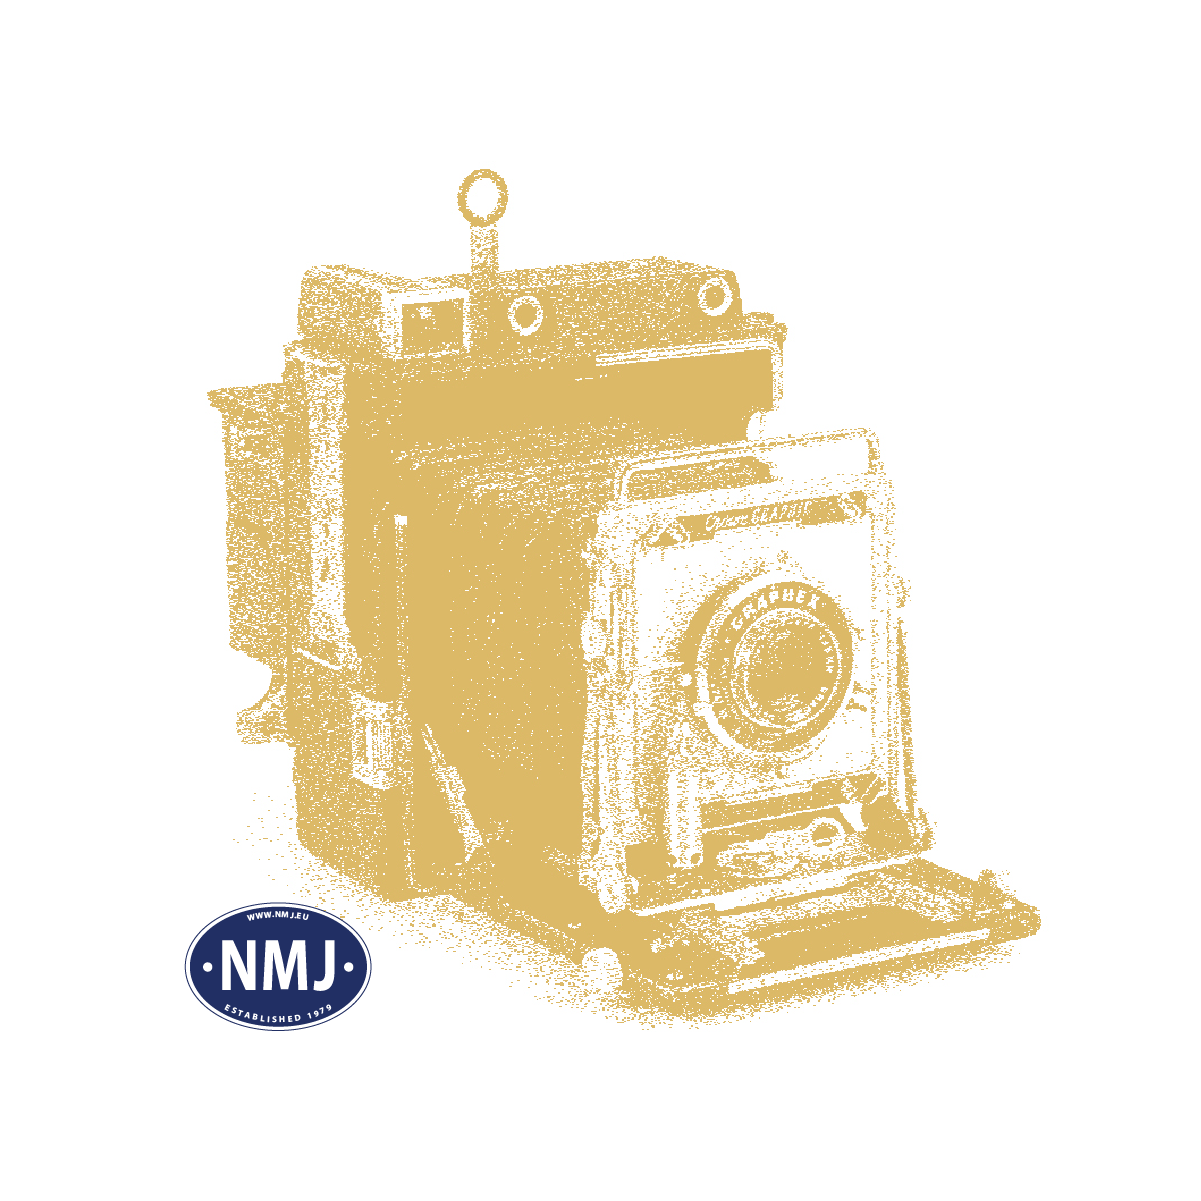 MBR50-3003 - Kleine Büsche dunkelgelb, 3 Stück, 4-6cm, N/TT/H0/0